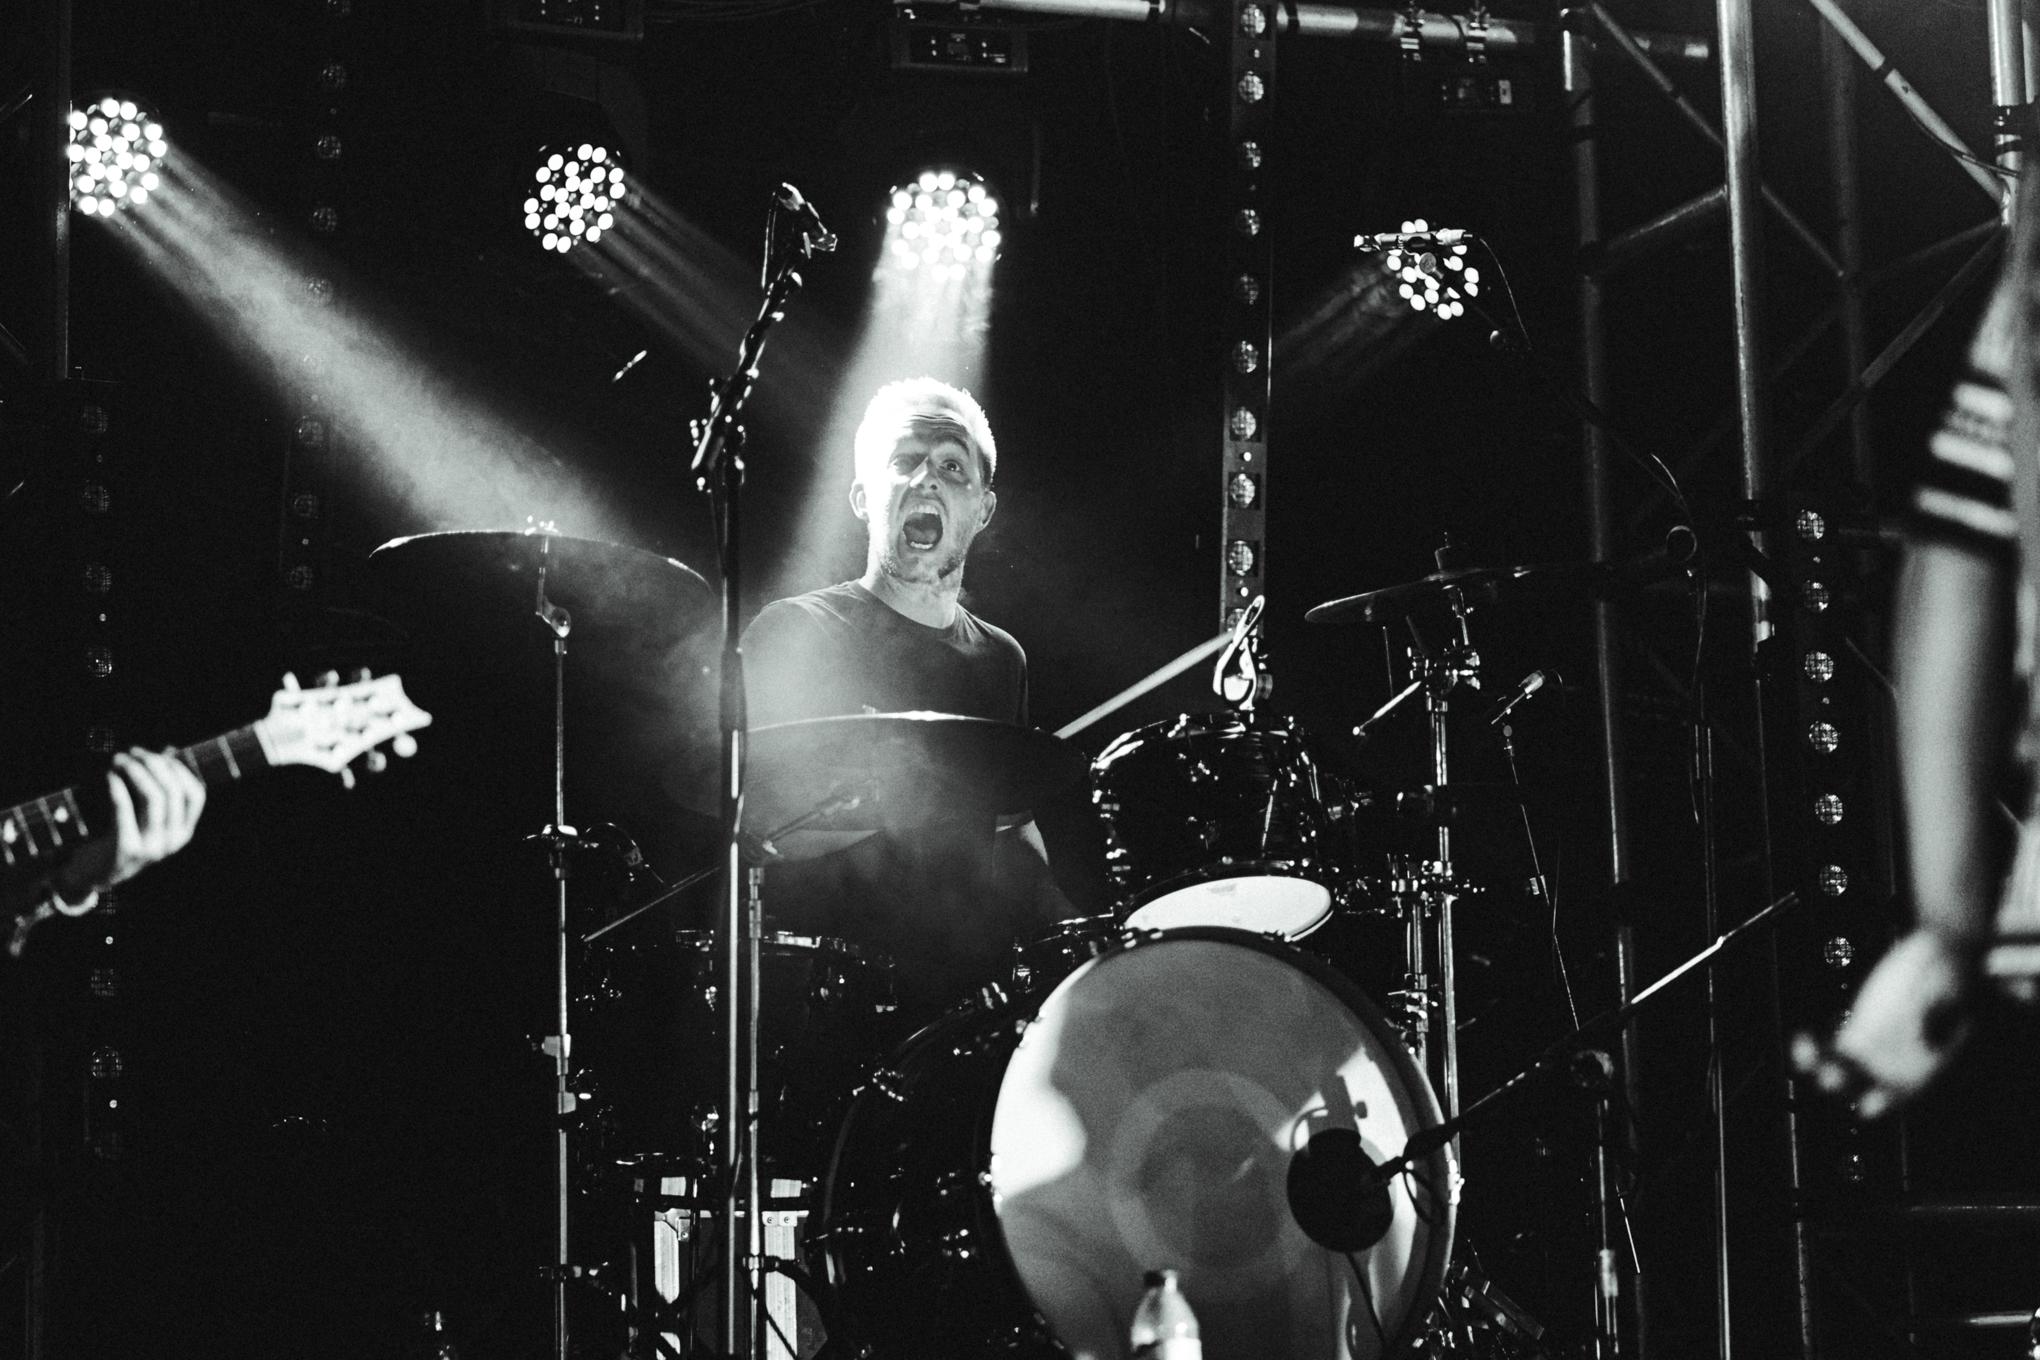 Tim Reynolds Drummer Next Level